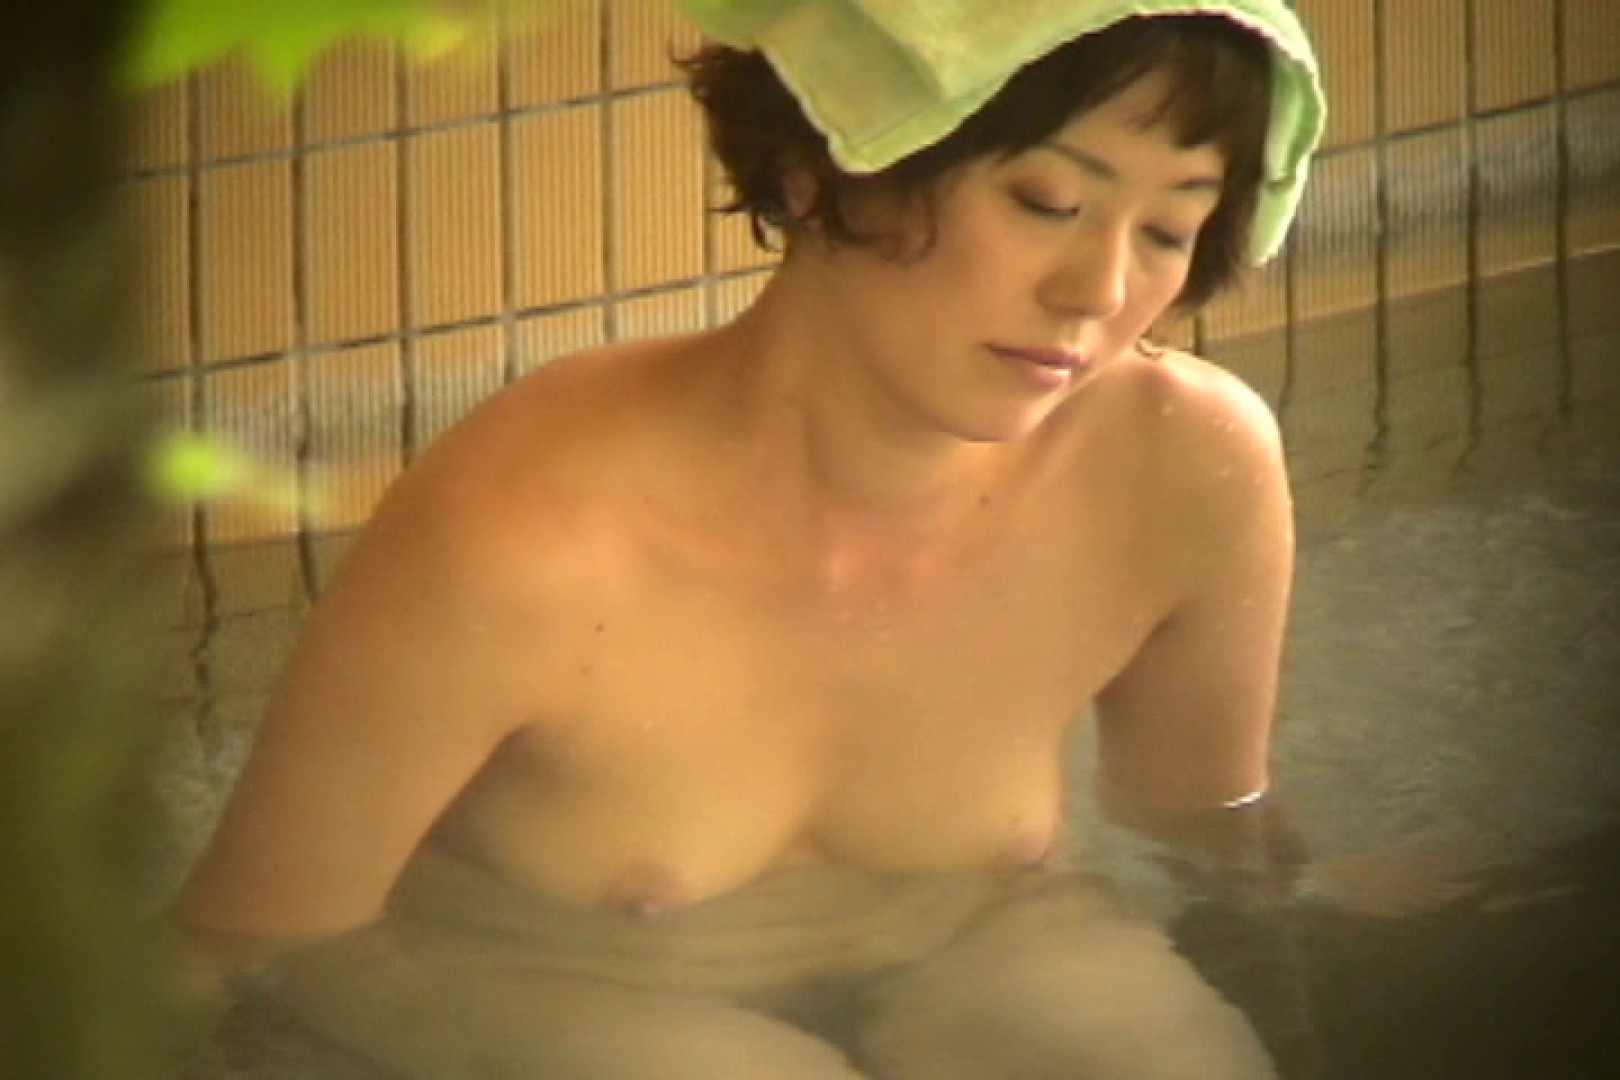 Aquaな露天風呂Vol.456 盗撮師作品  88pic 81